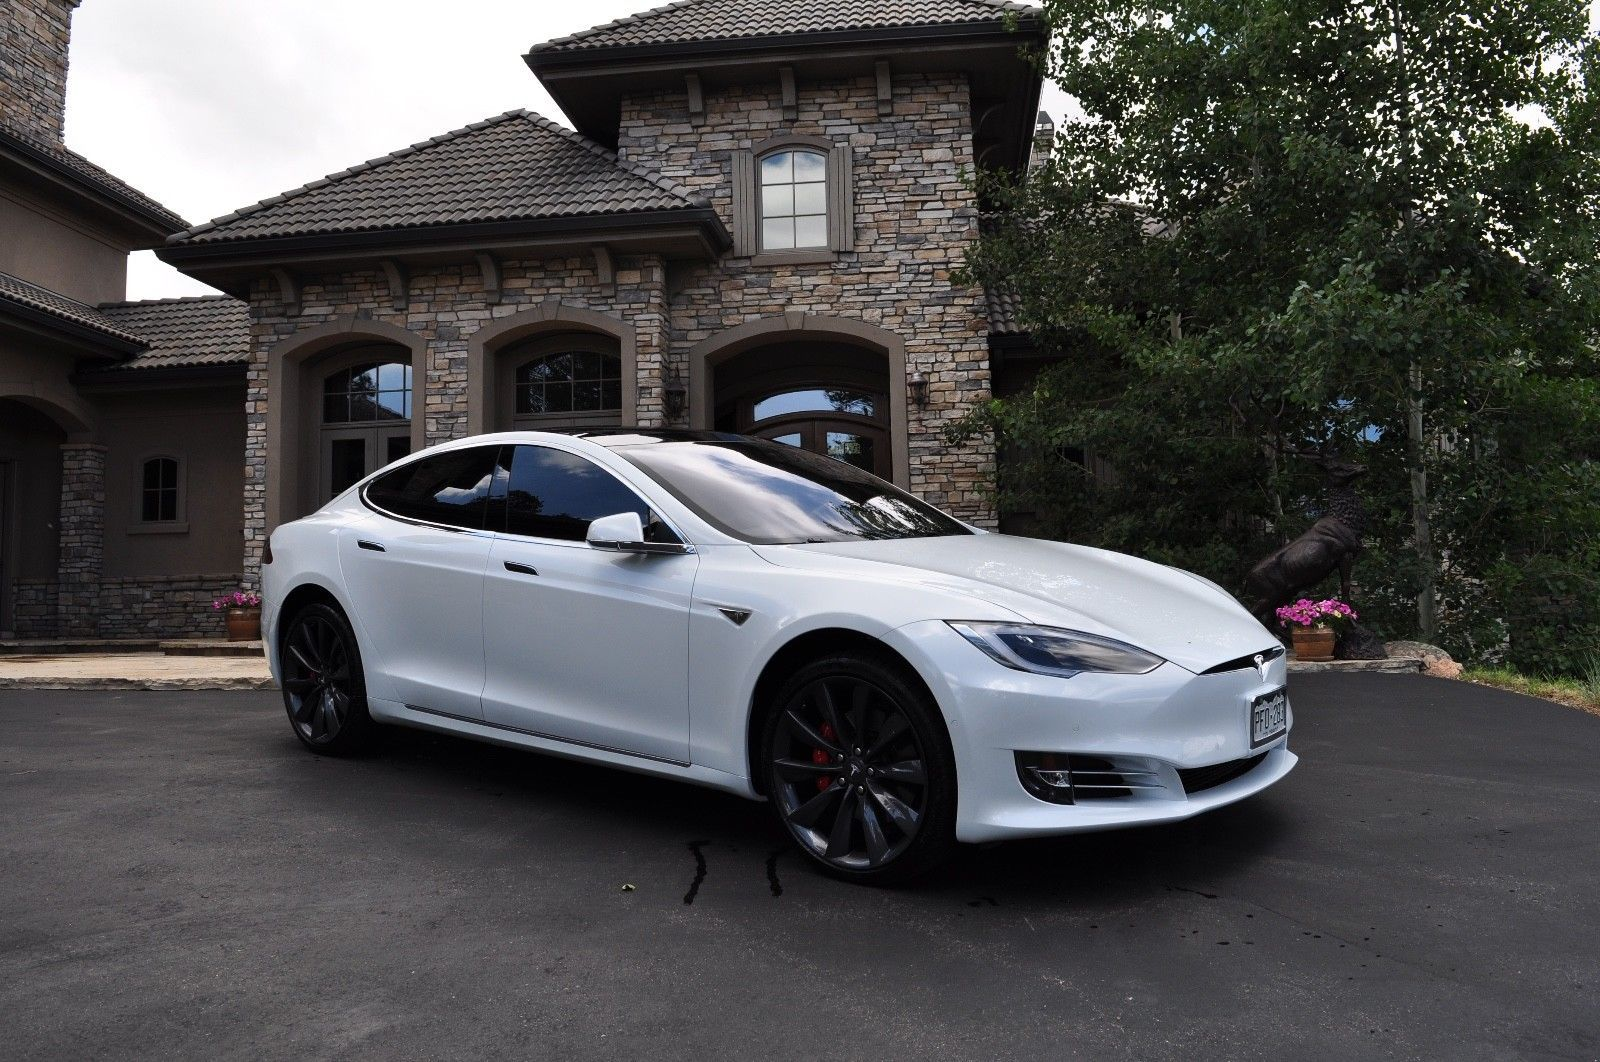 2016 Tesla Model S P 90 D Ludicrous Tesla Model S P90d Ludicrous Pearl White 167k Msrp Every Option 8700 Miles Tesla Model S White Tesla Model S Tesla Model